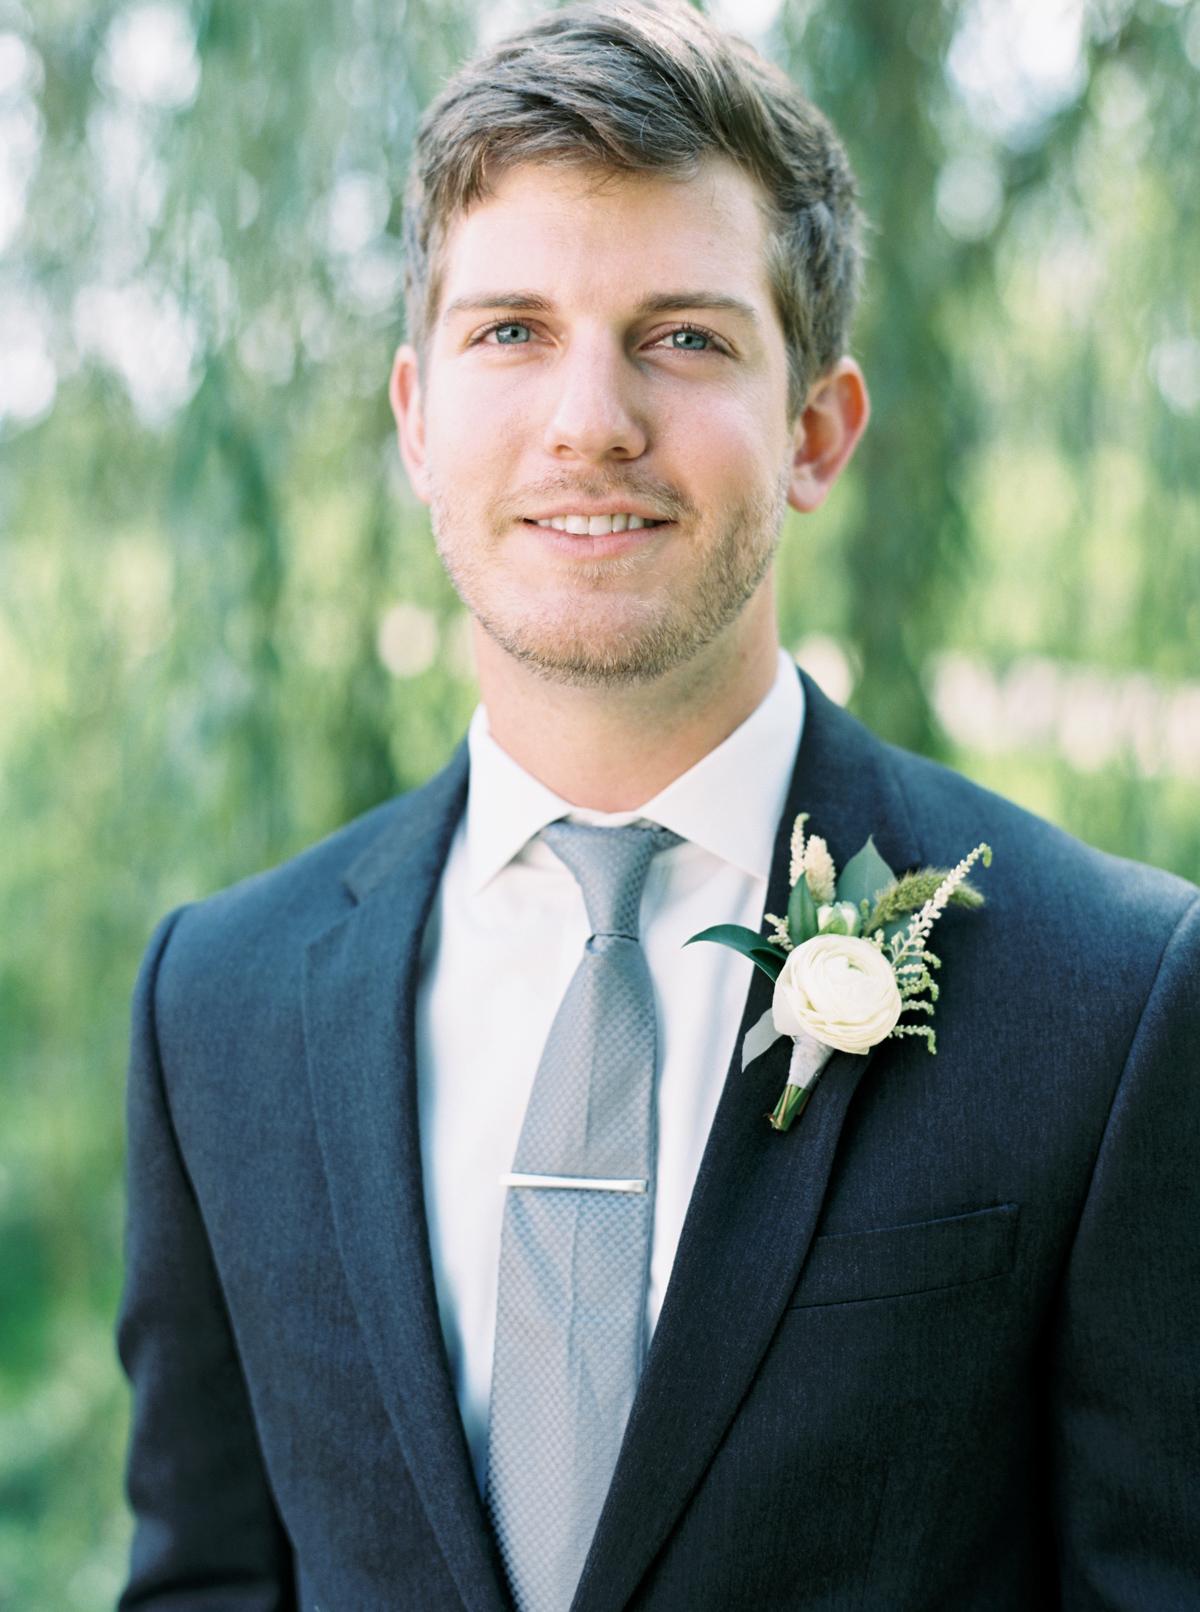 winmock-kinderton-wedding-024.jpg